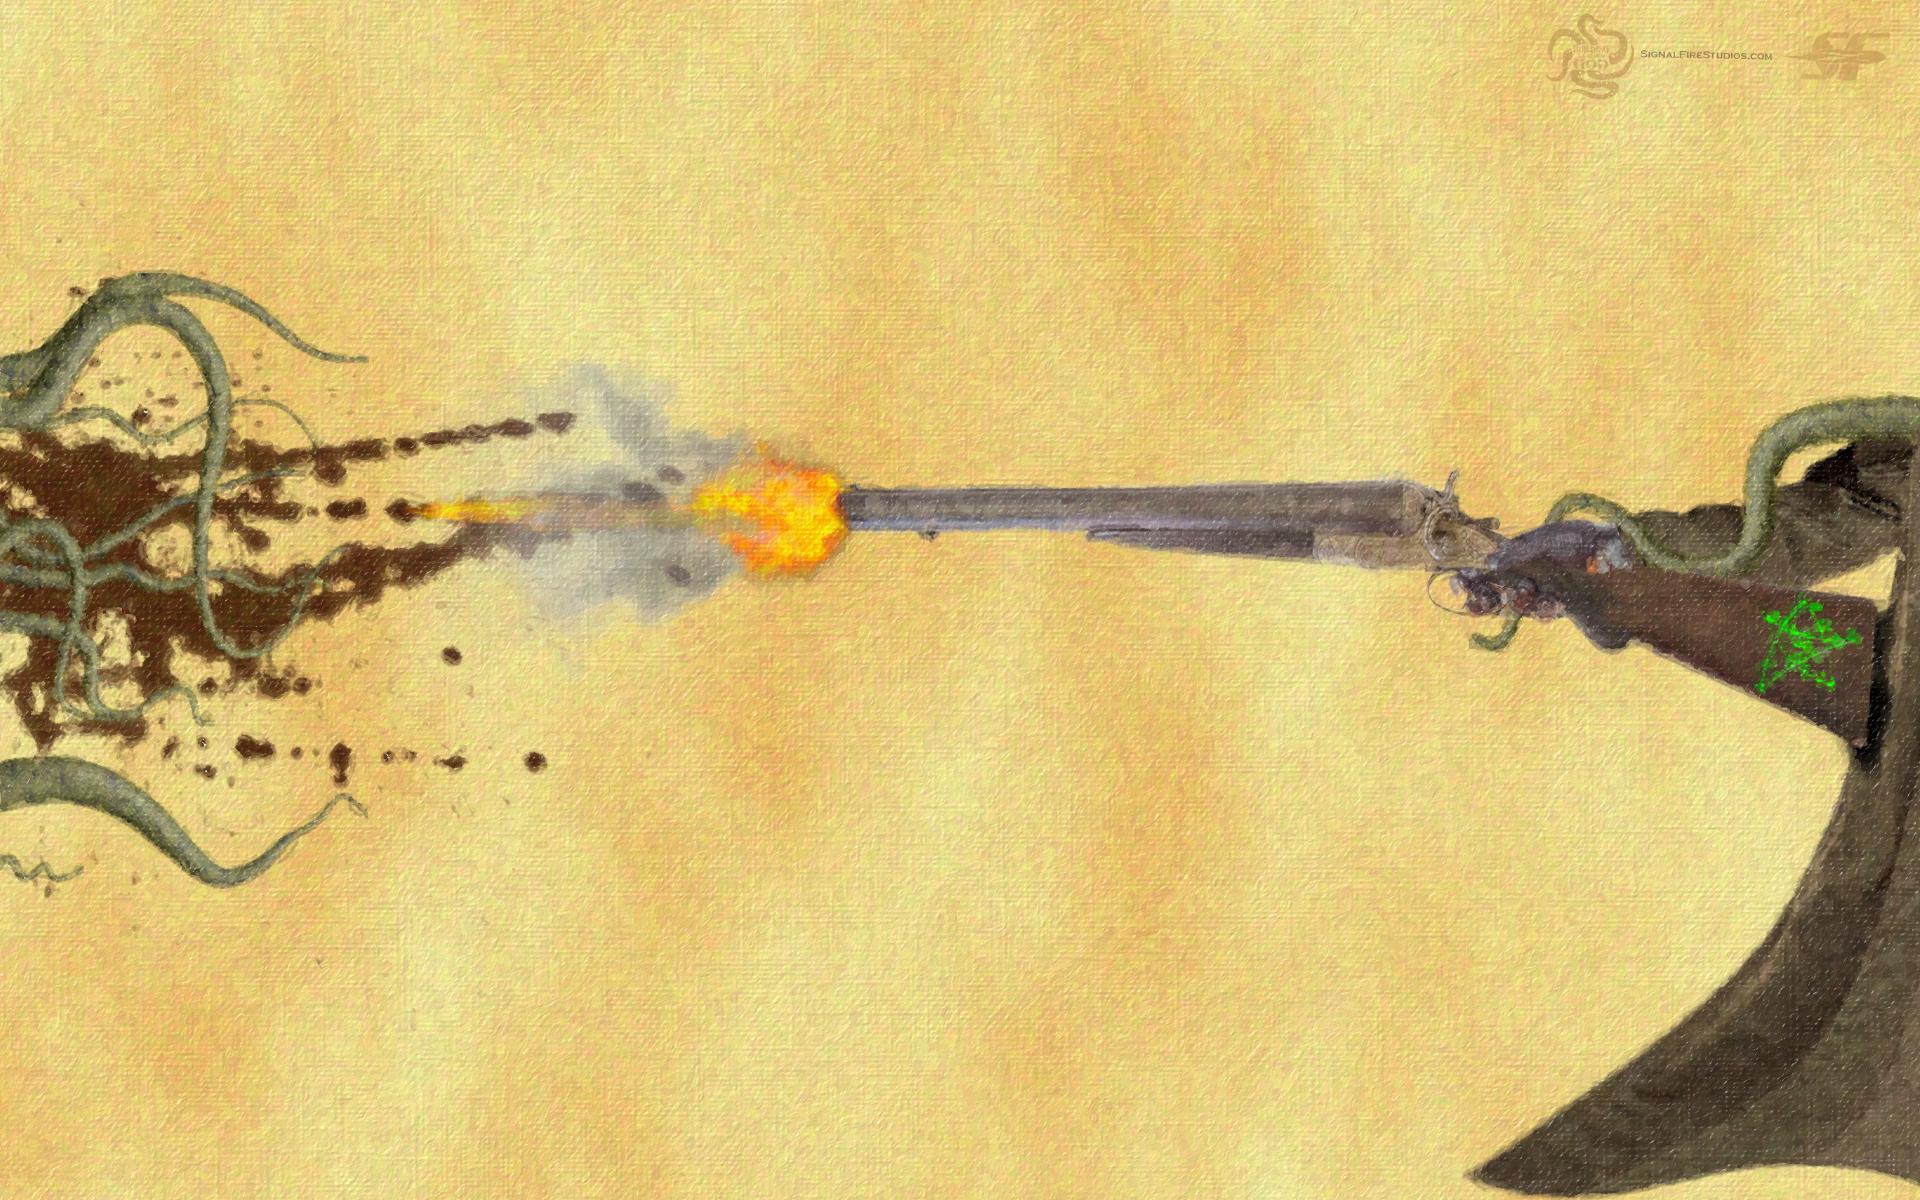 Tentacle Shotgun Wallpaper – Free Download – Signal Fire Studios LLC